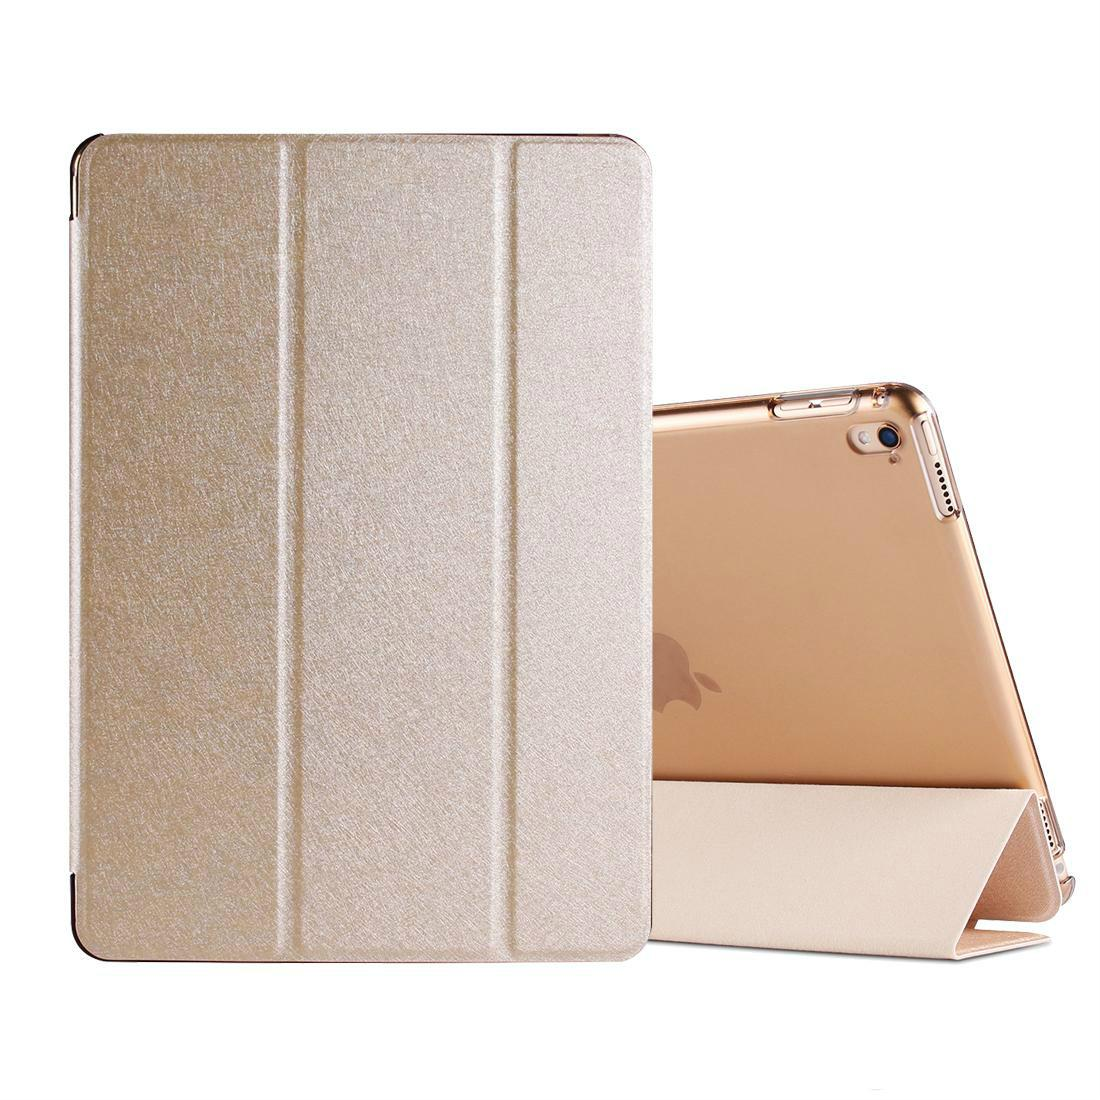 pu leather smart case for ipad mini 4 3 2 air 2 pro 9 7 flip covercheap sgp armor case best cute iphone 6s cases for girls